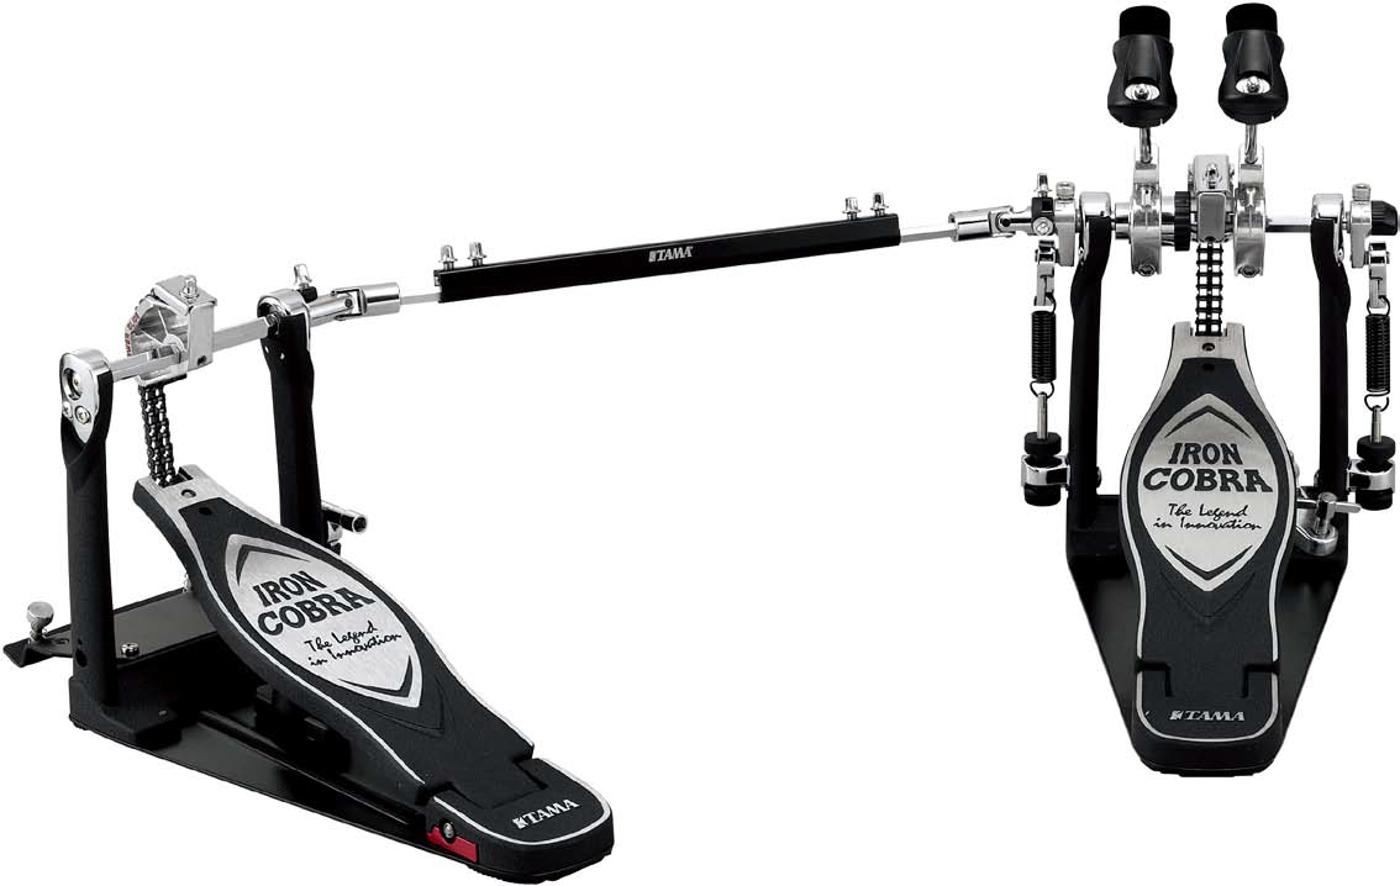 Iron Cobra Power Glide Twin Pedal